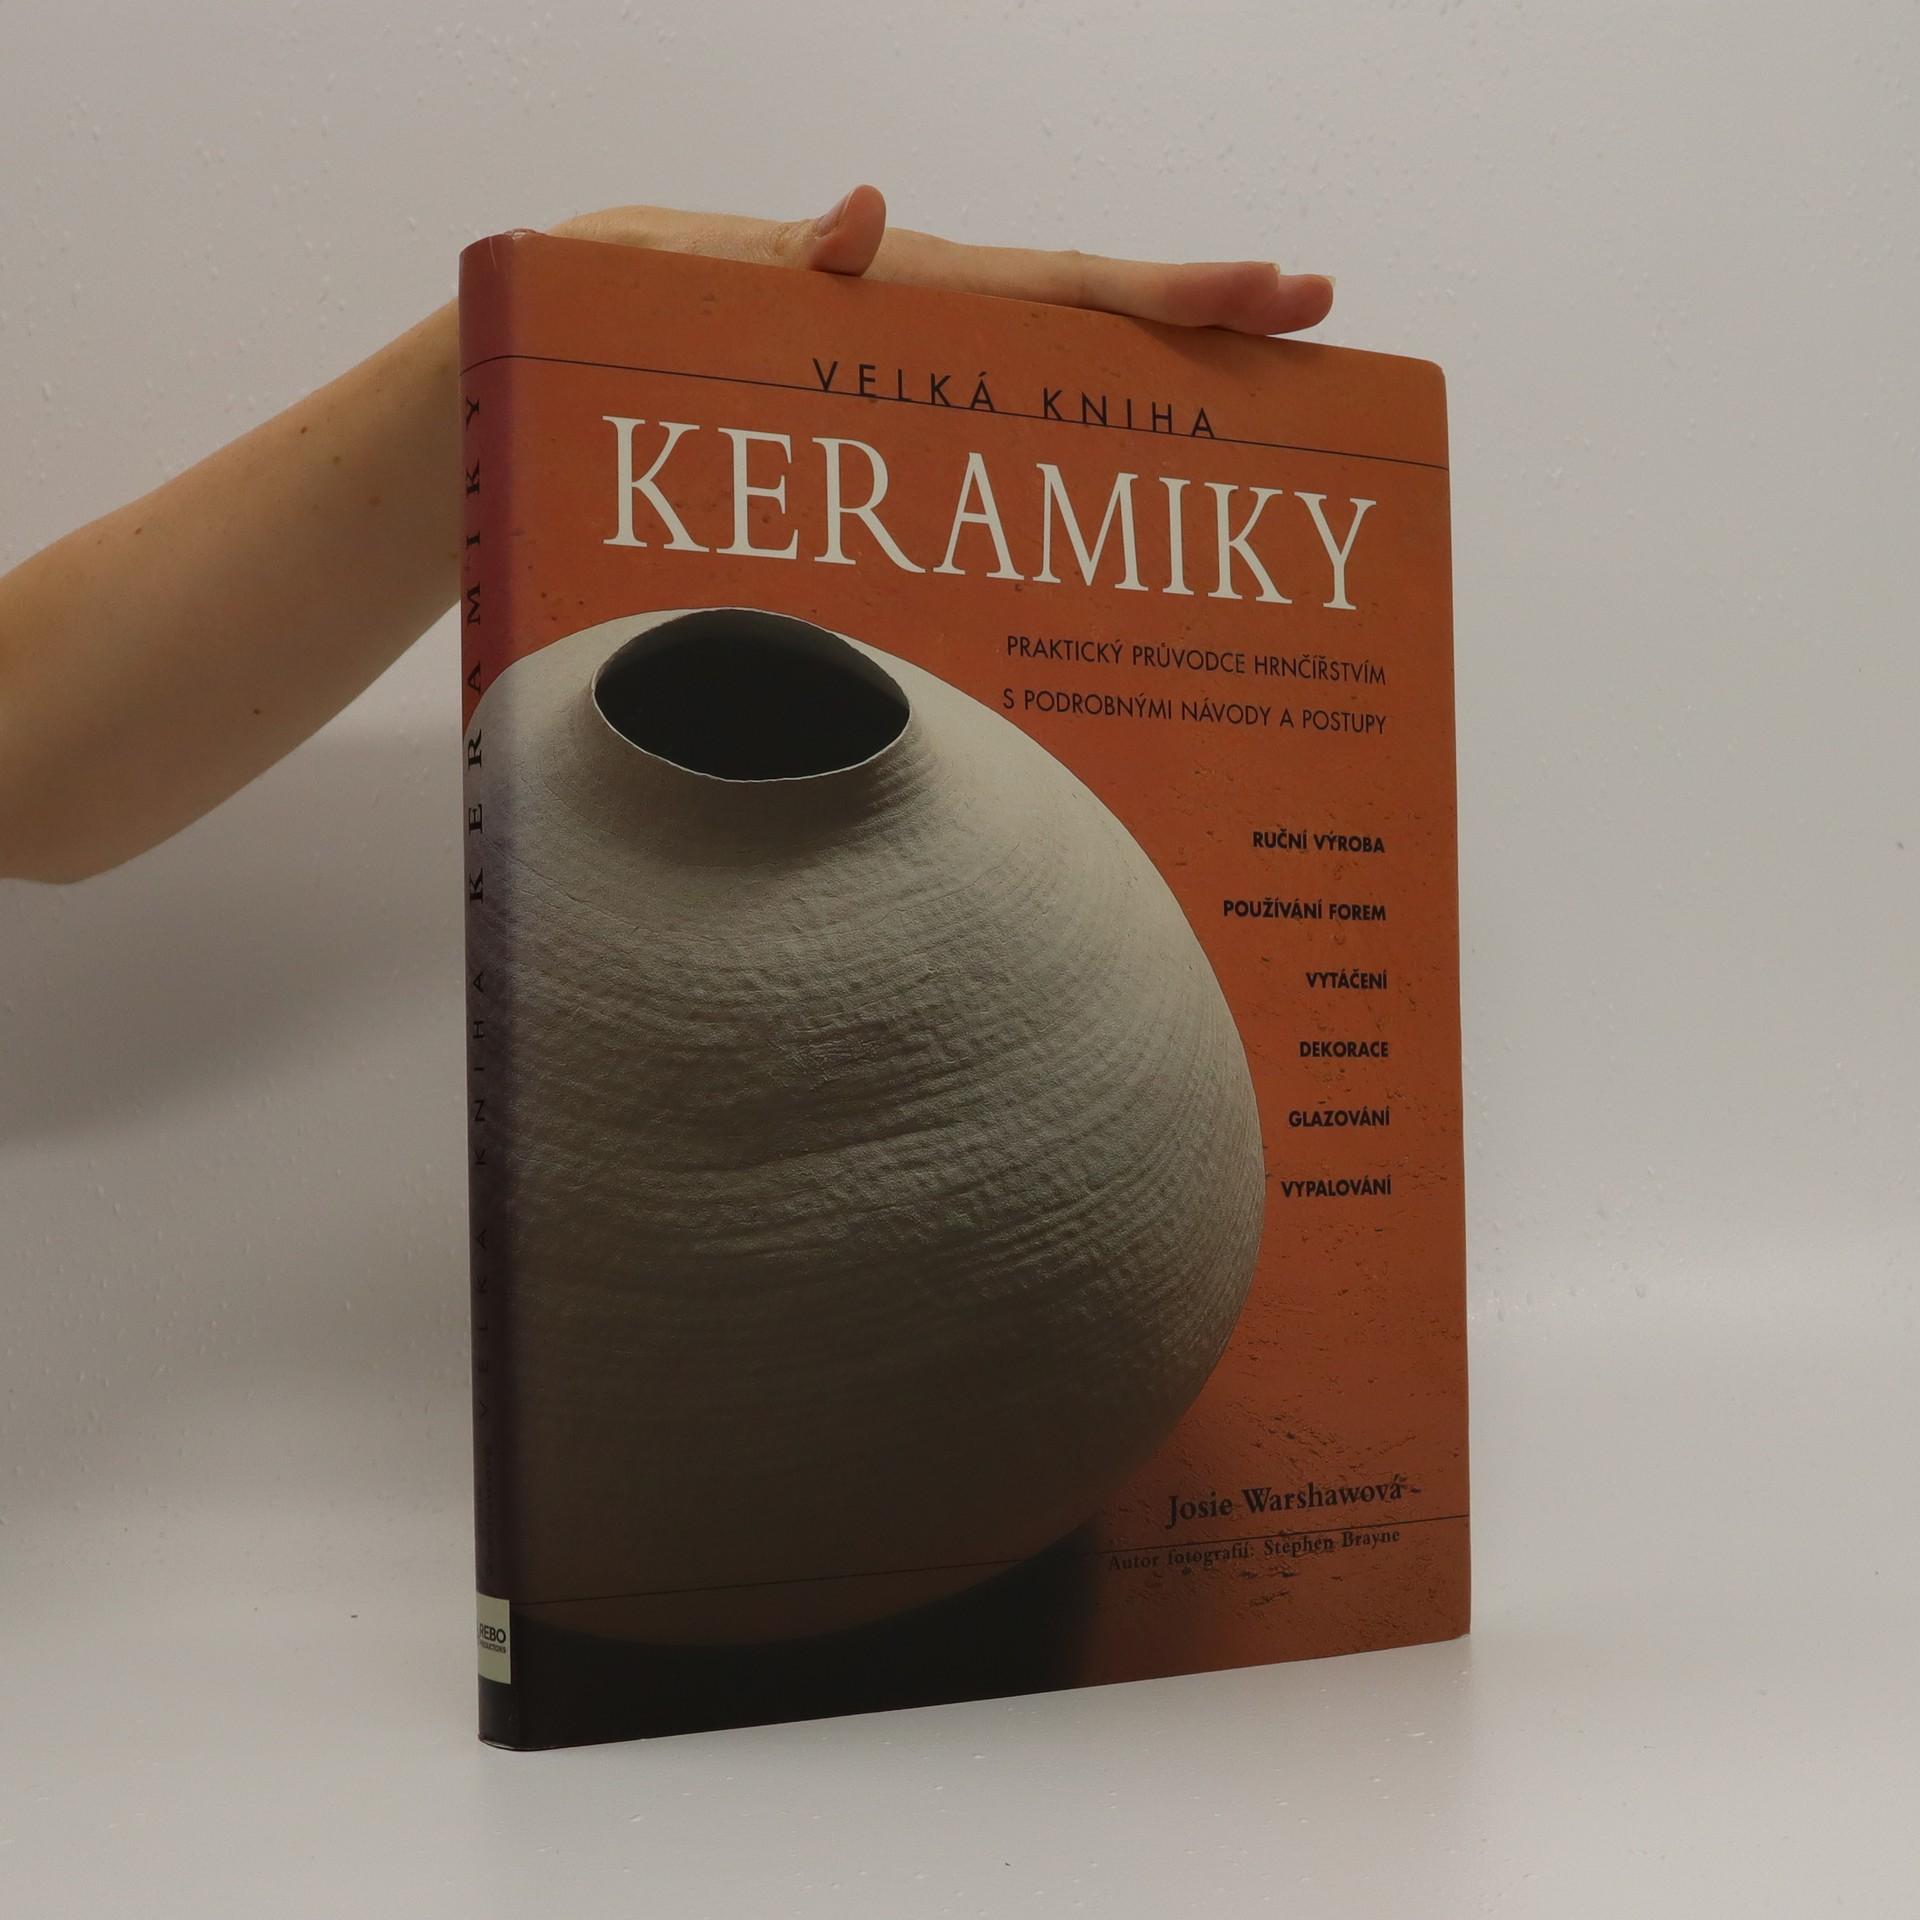 antikvární kniha Velká kniha keramiky, neuveden